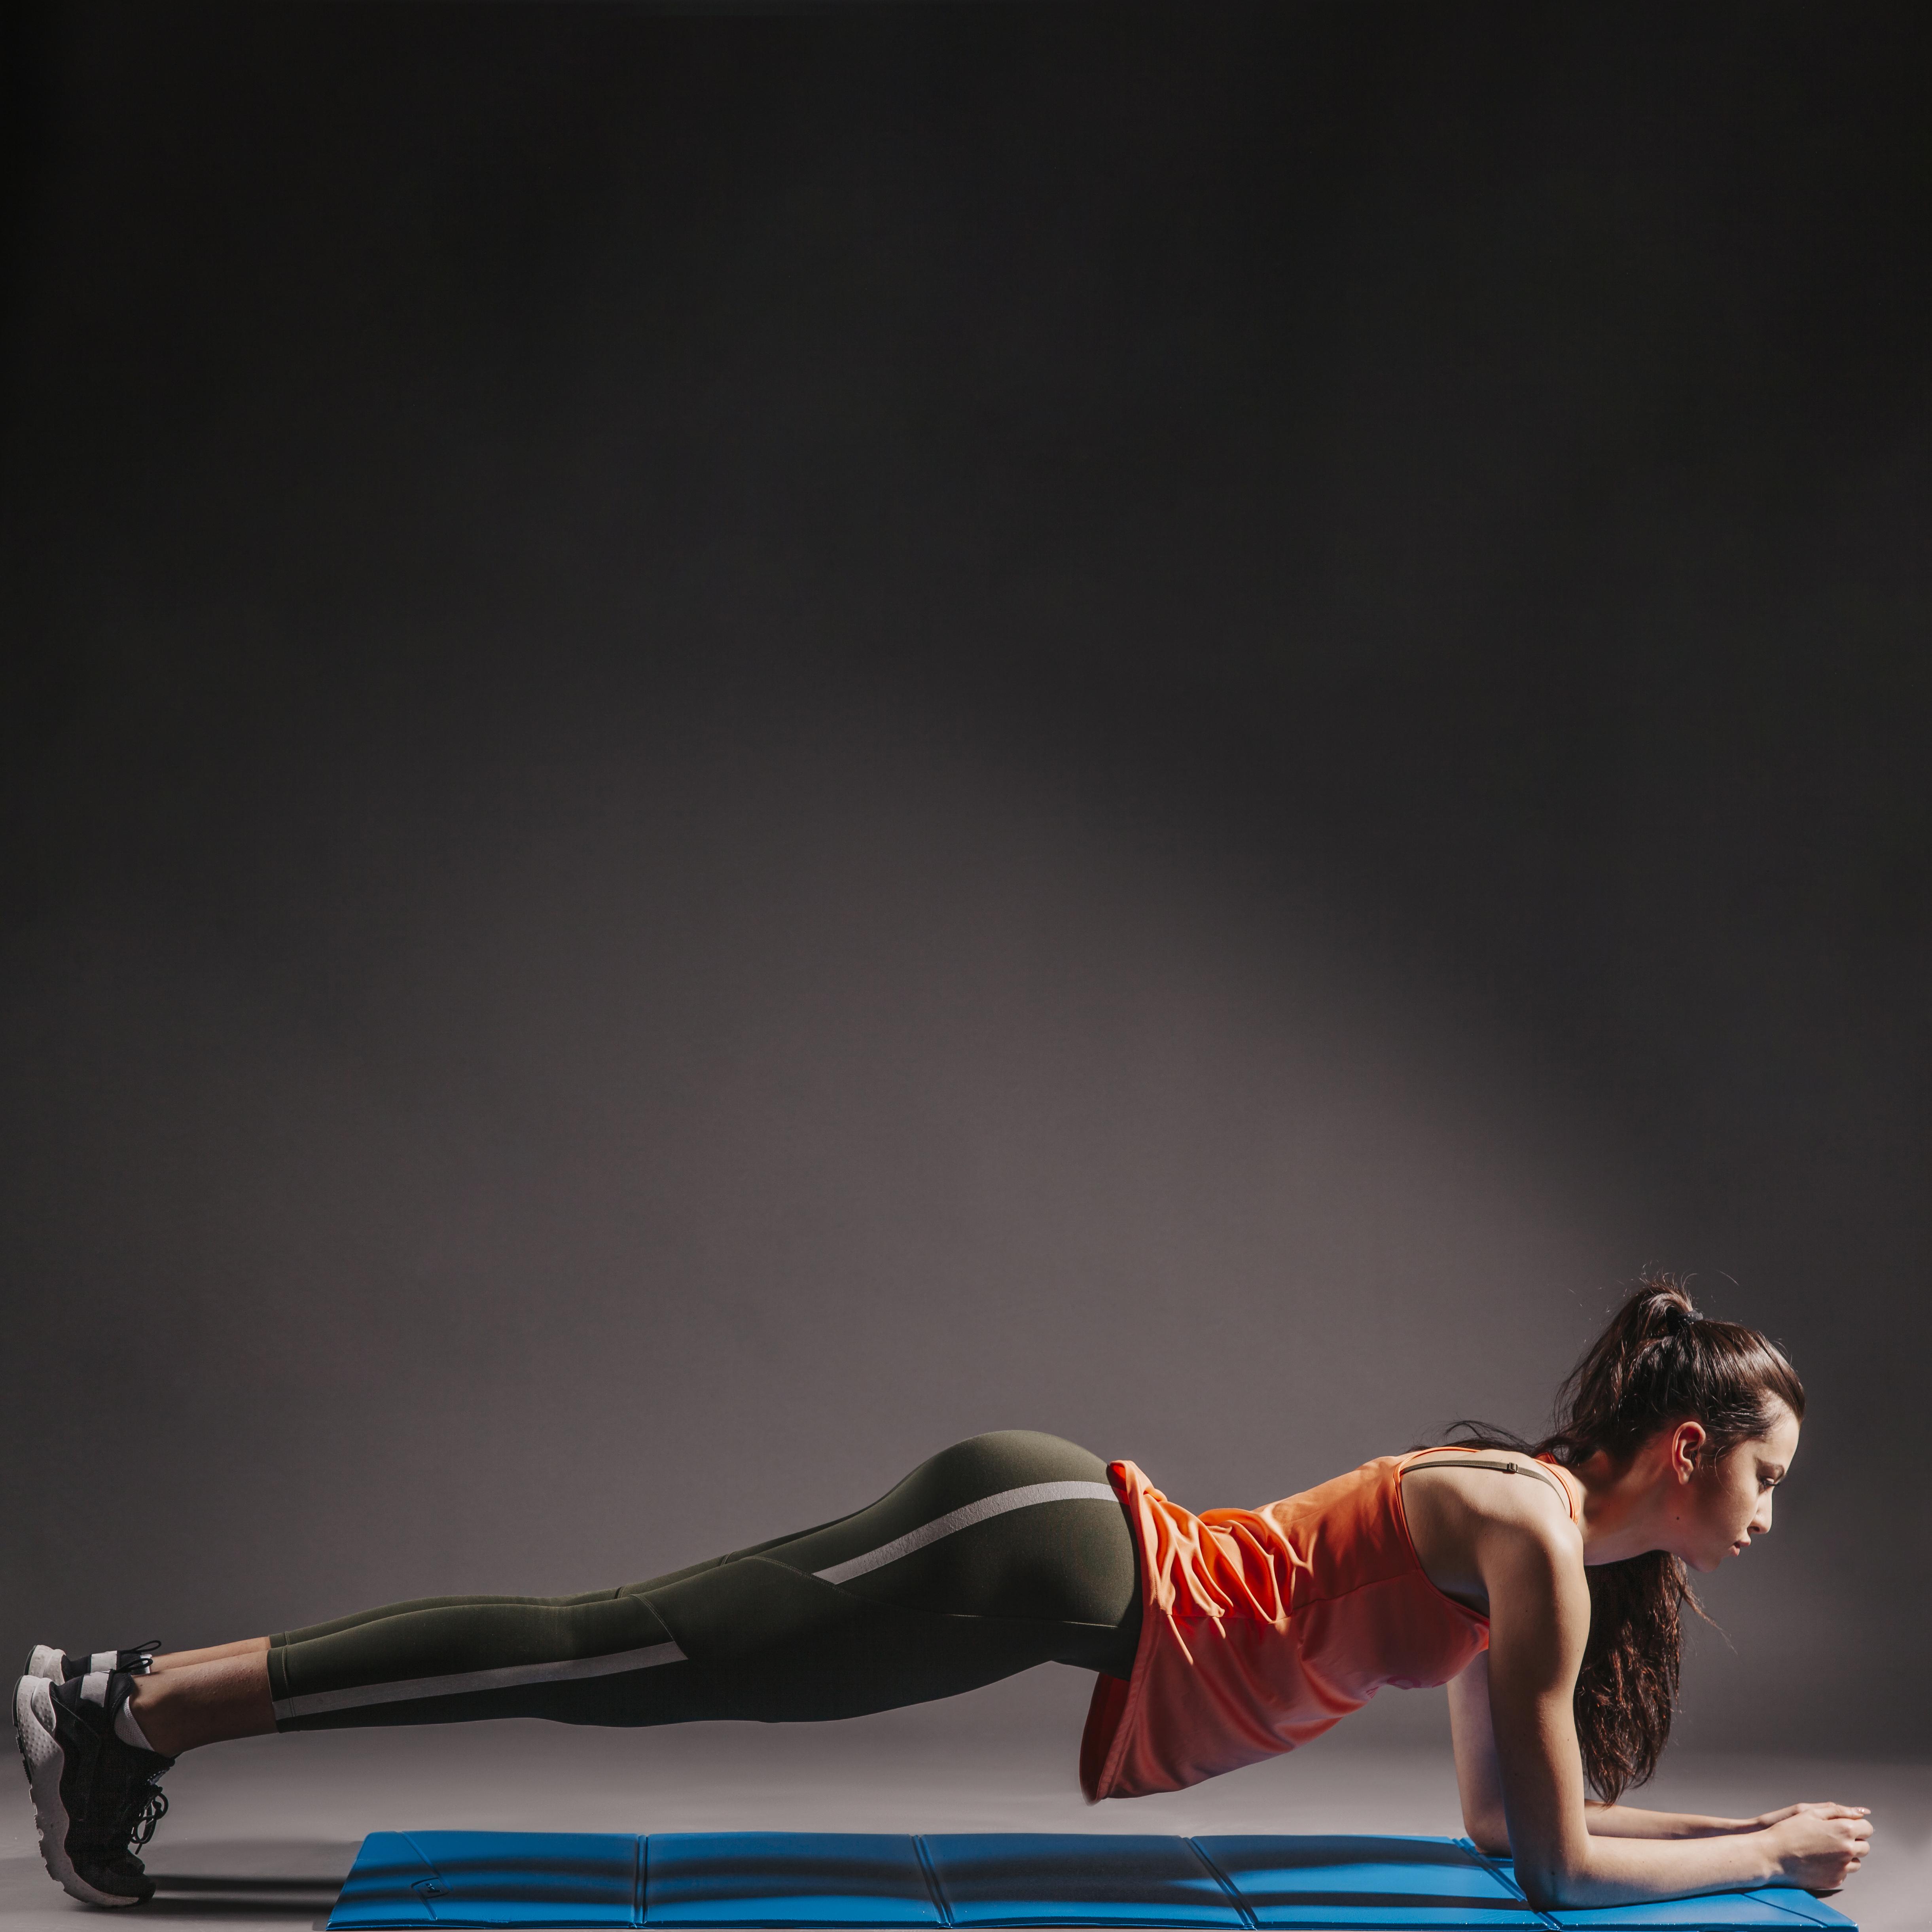 junge Frau macht Plank